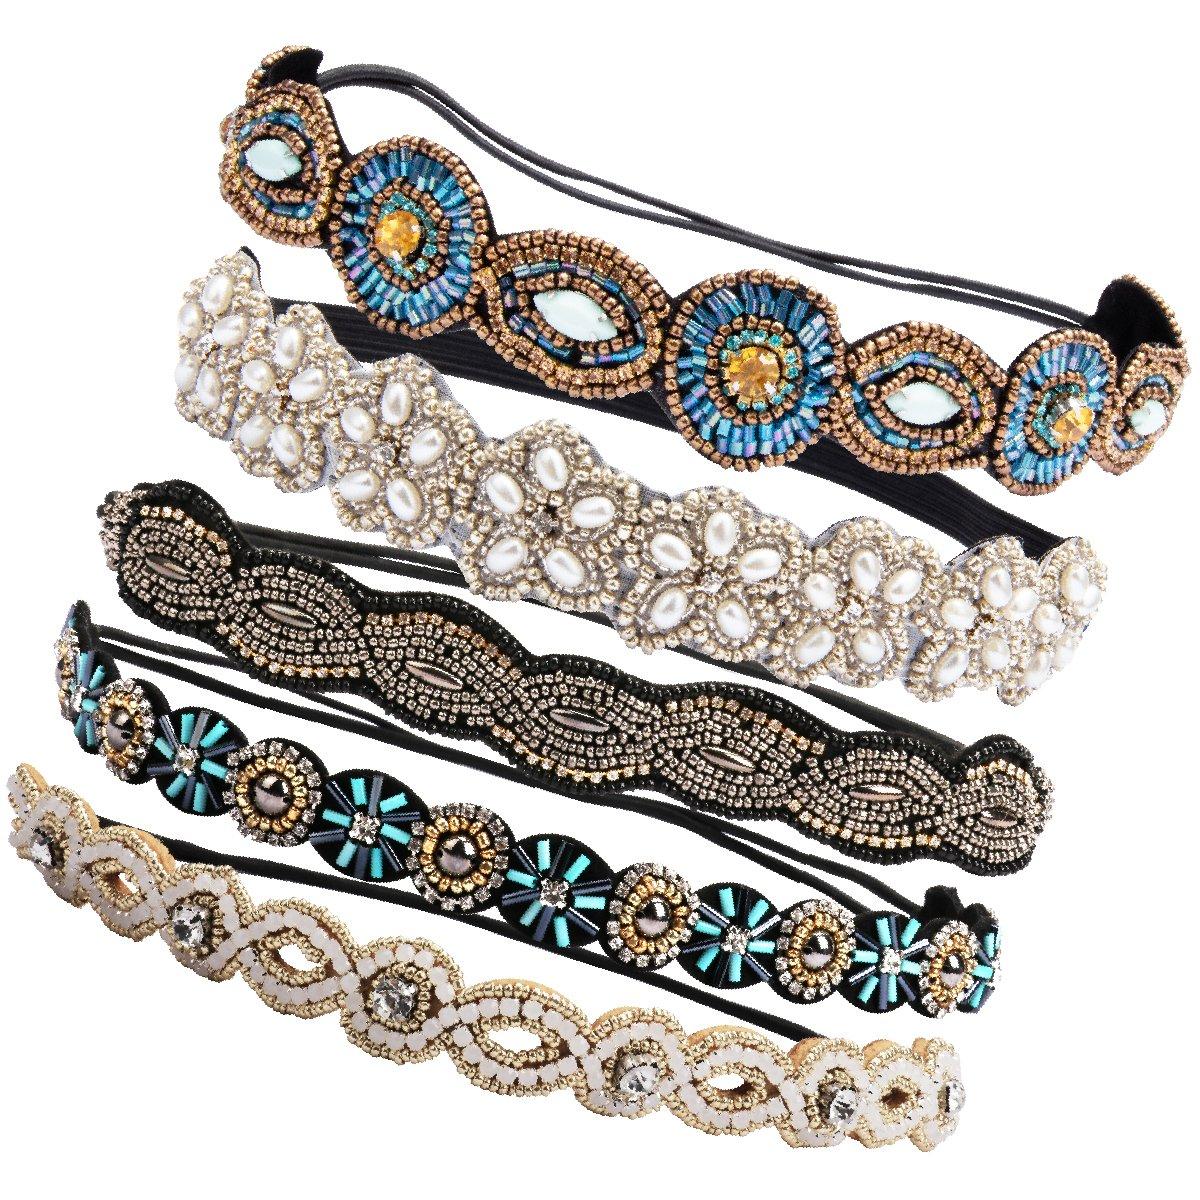 Ondder 5 Pieces Rhinestone Beads Elastic Headband Handmade Crystal Beads Hairbands Hair Accessories For Women Girls